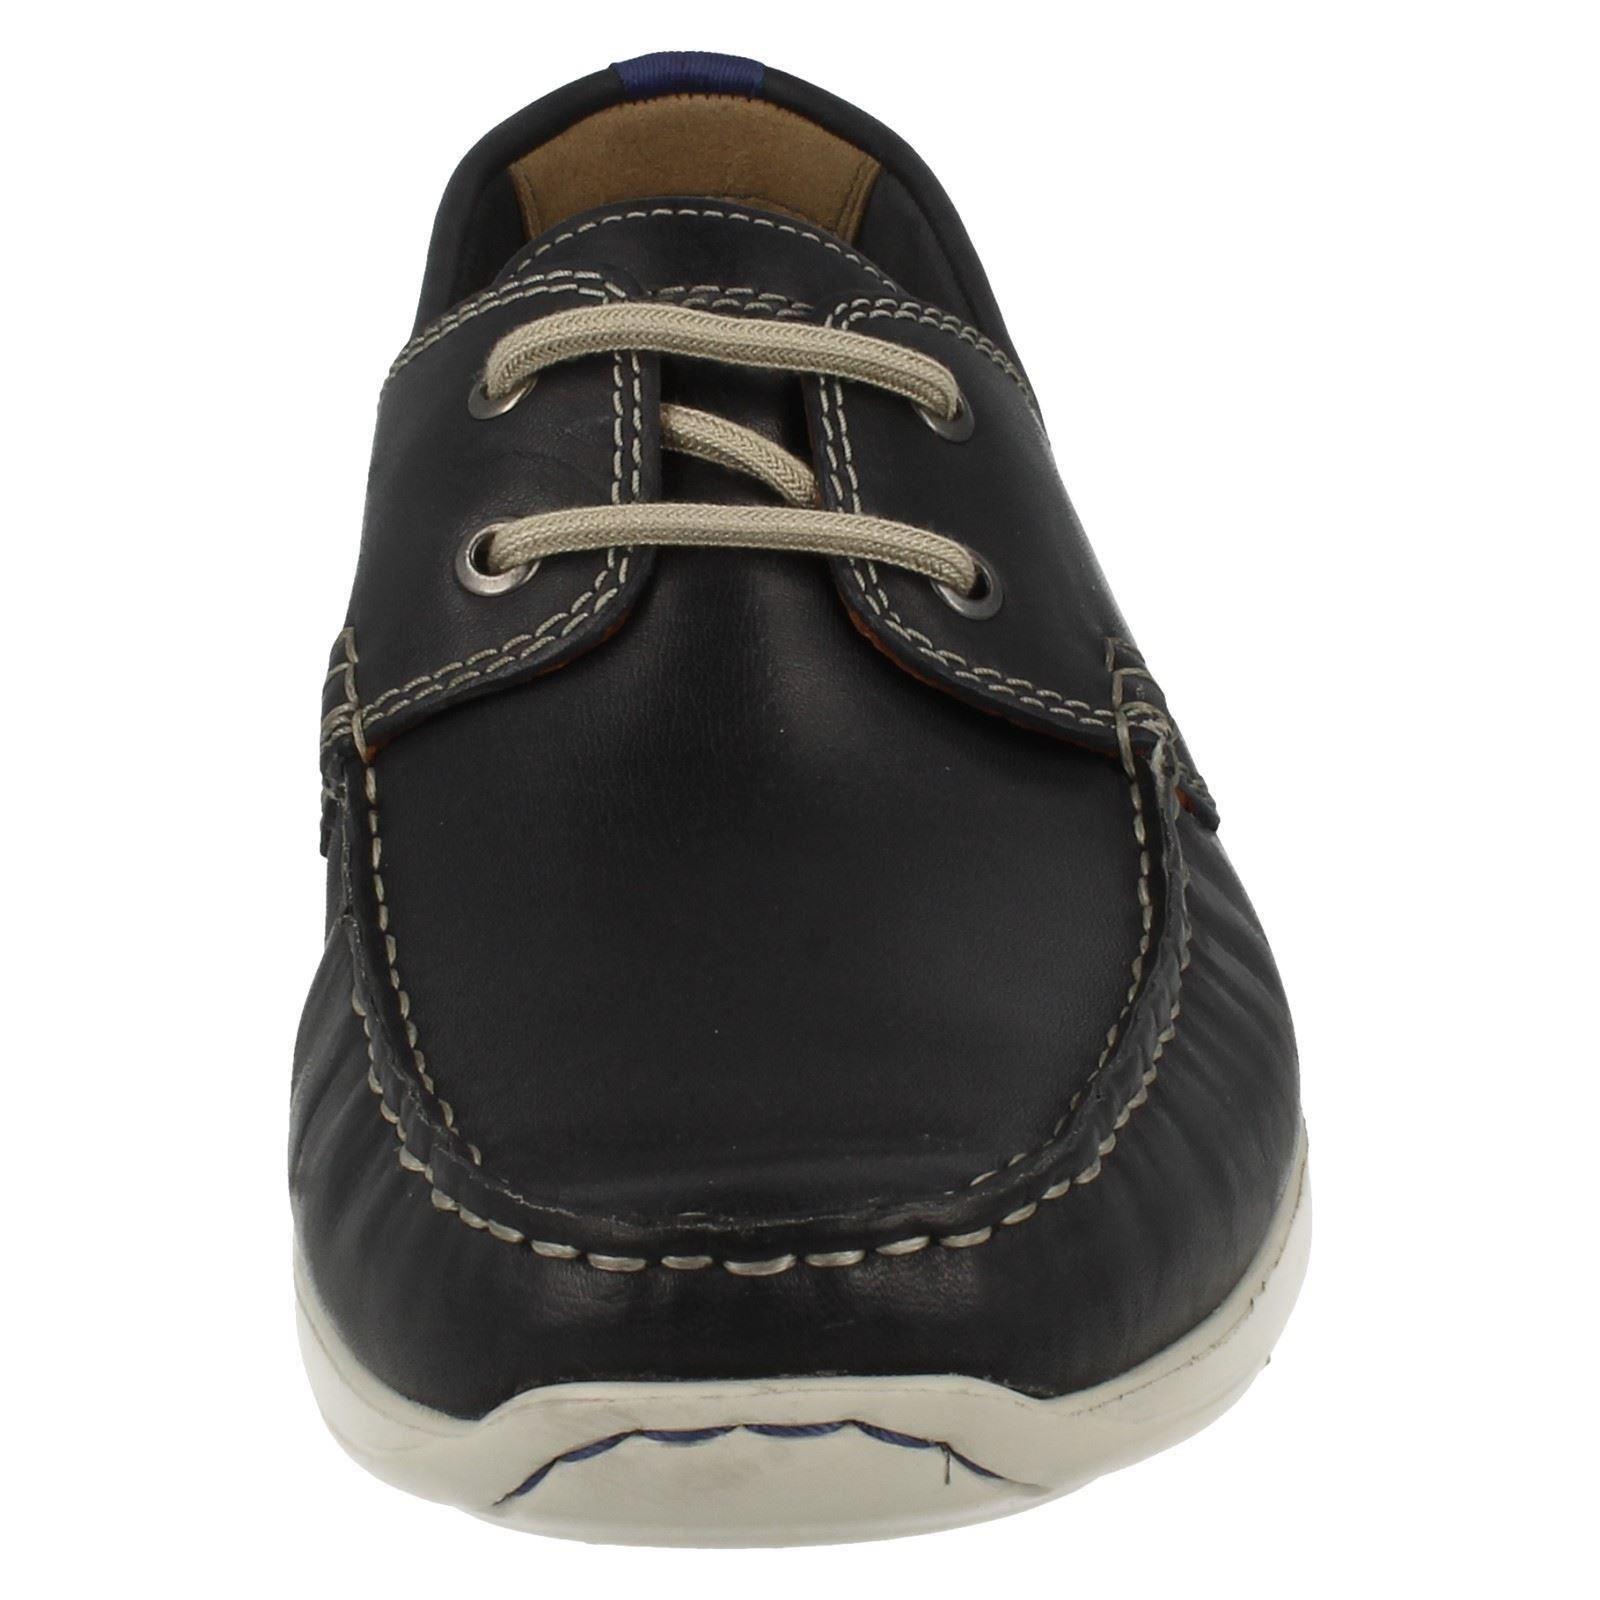 Karlock Uomo Clarks Casual Schuhes Karlock  Step 83a0a4